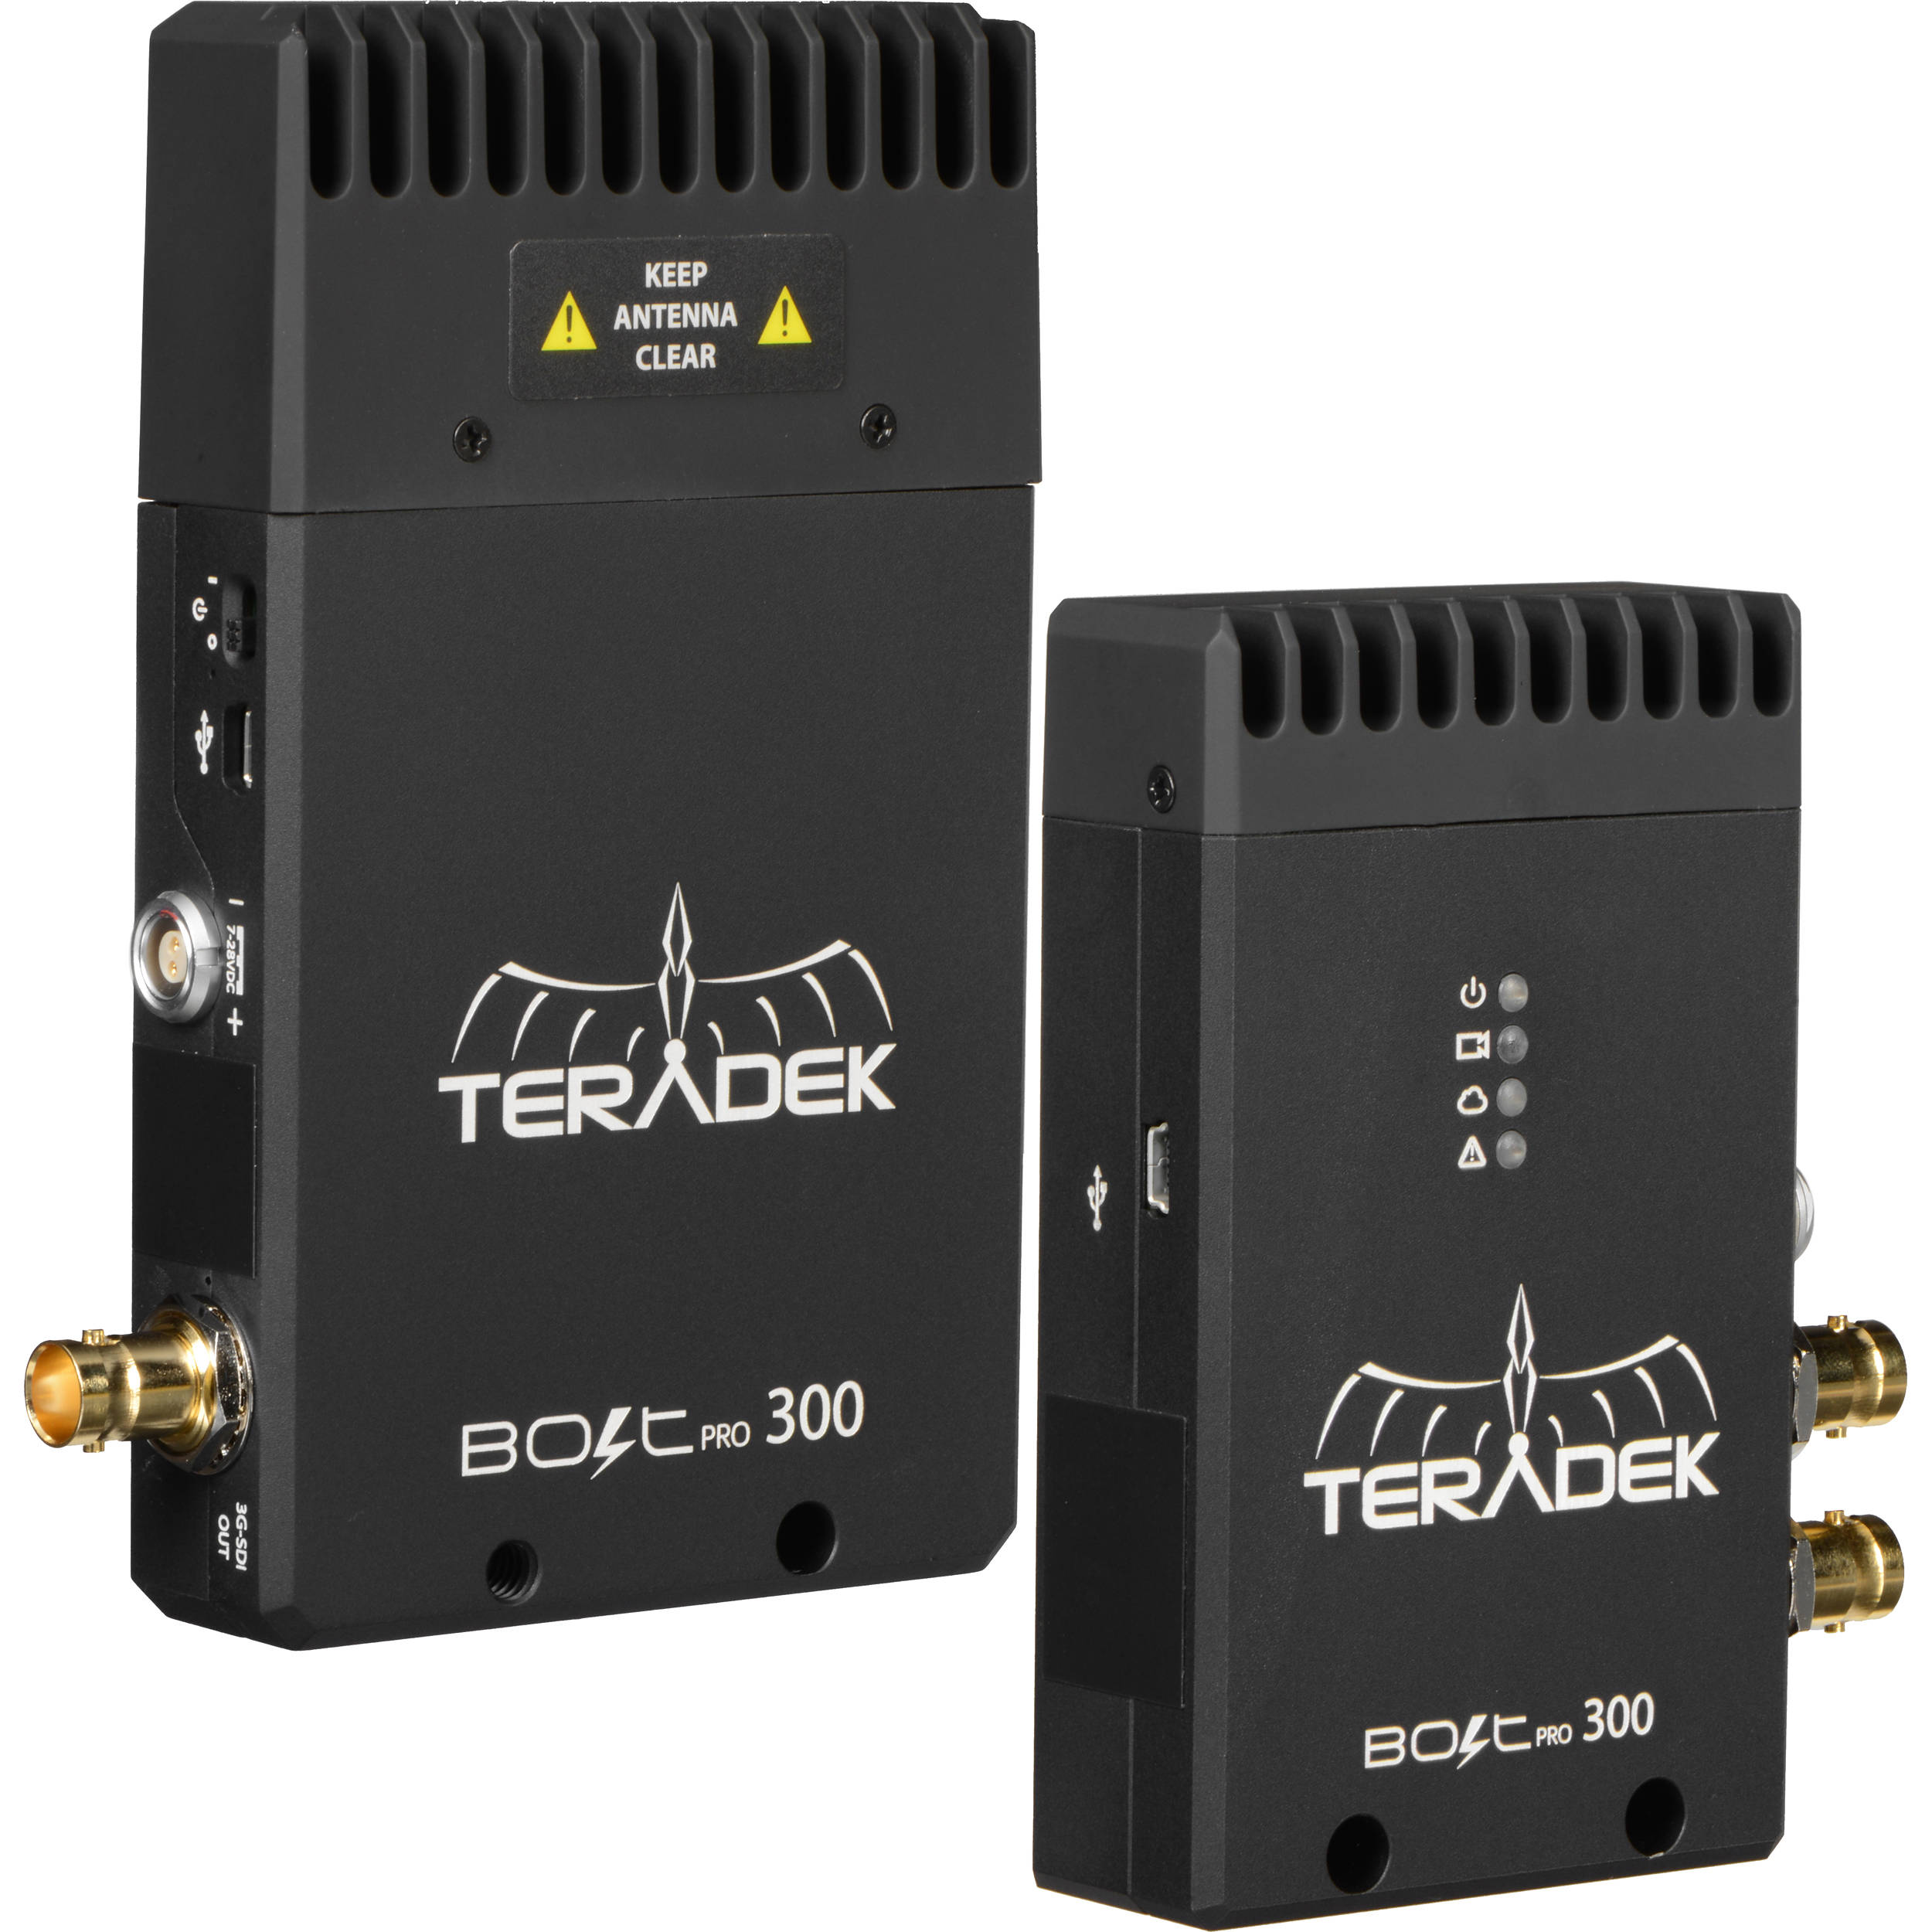 Wireless Transmitters And Receivers: Teradek Bolt Pro 300 3G-SDI Wireless 10-0920 B&H Photo Video